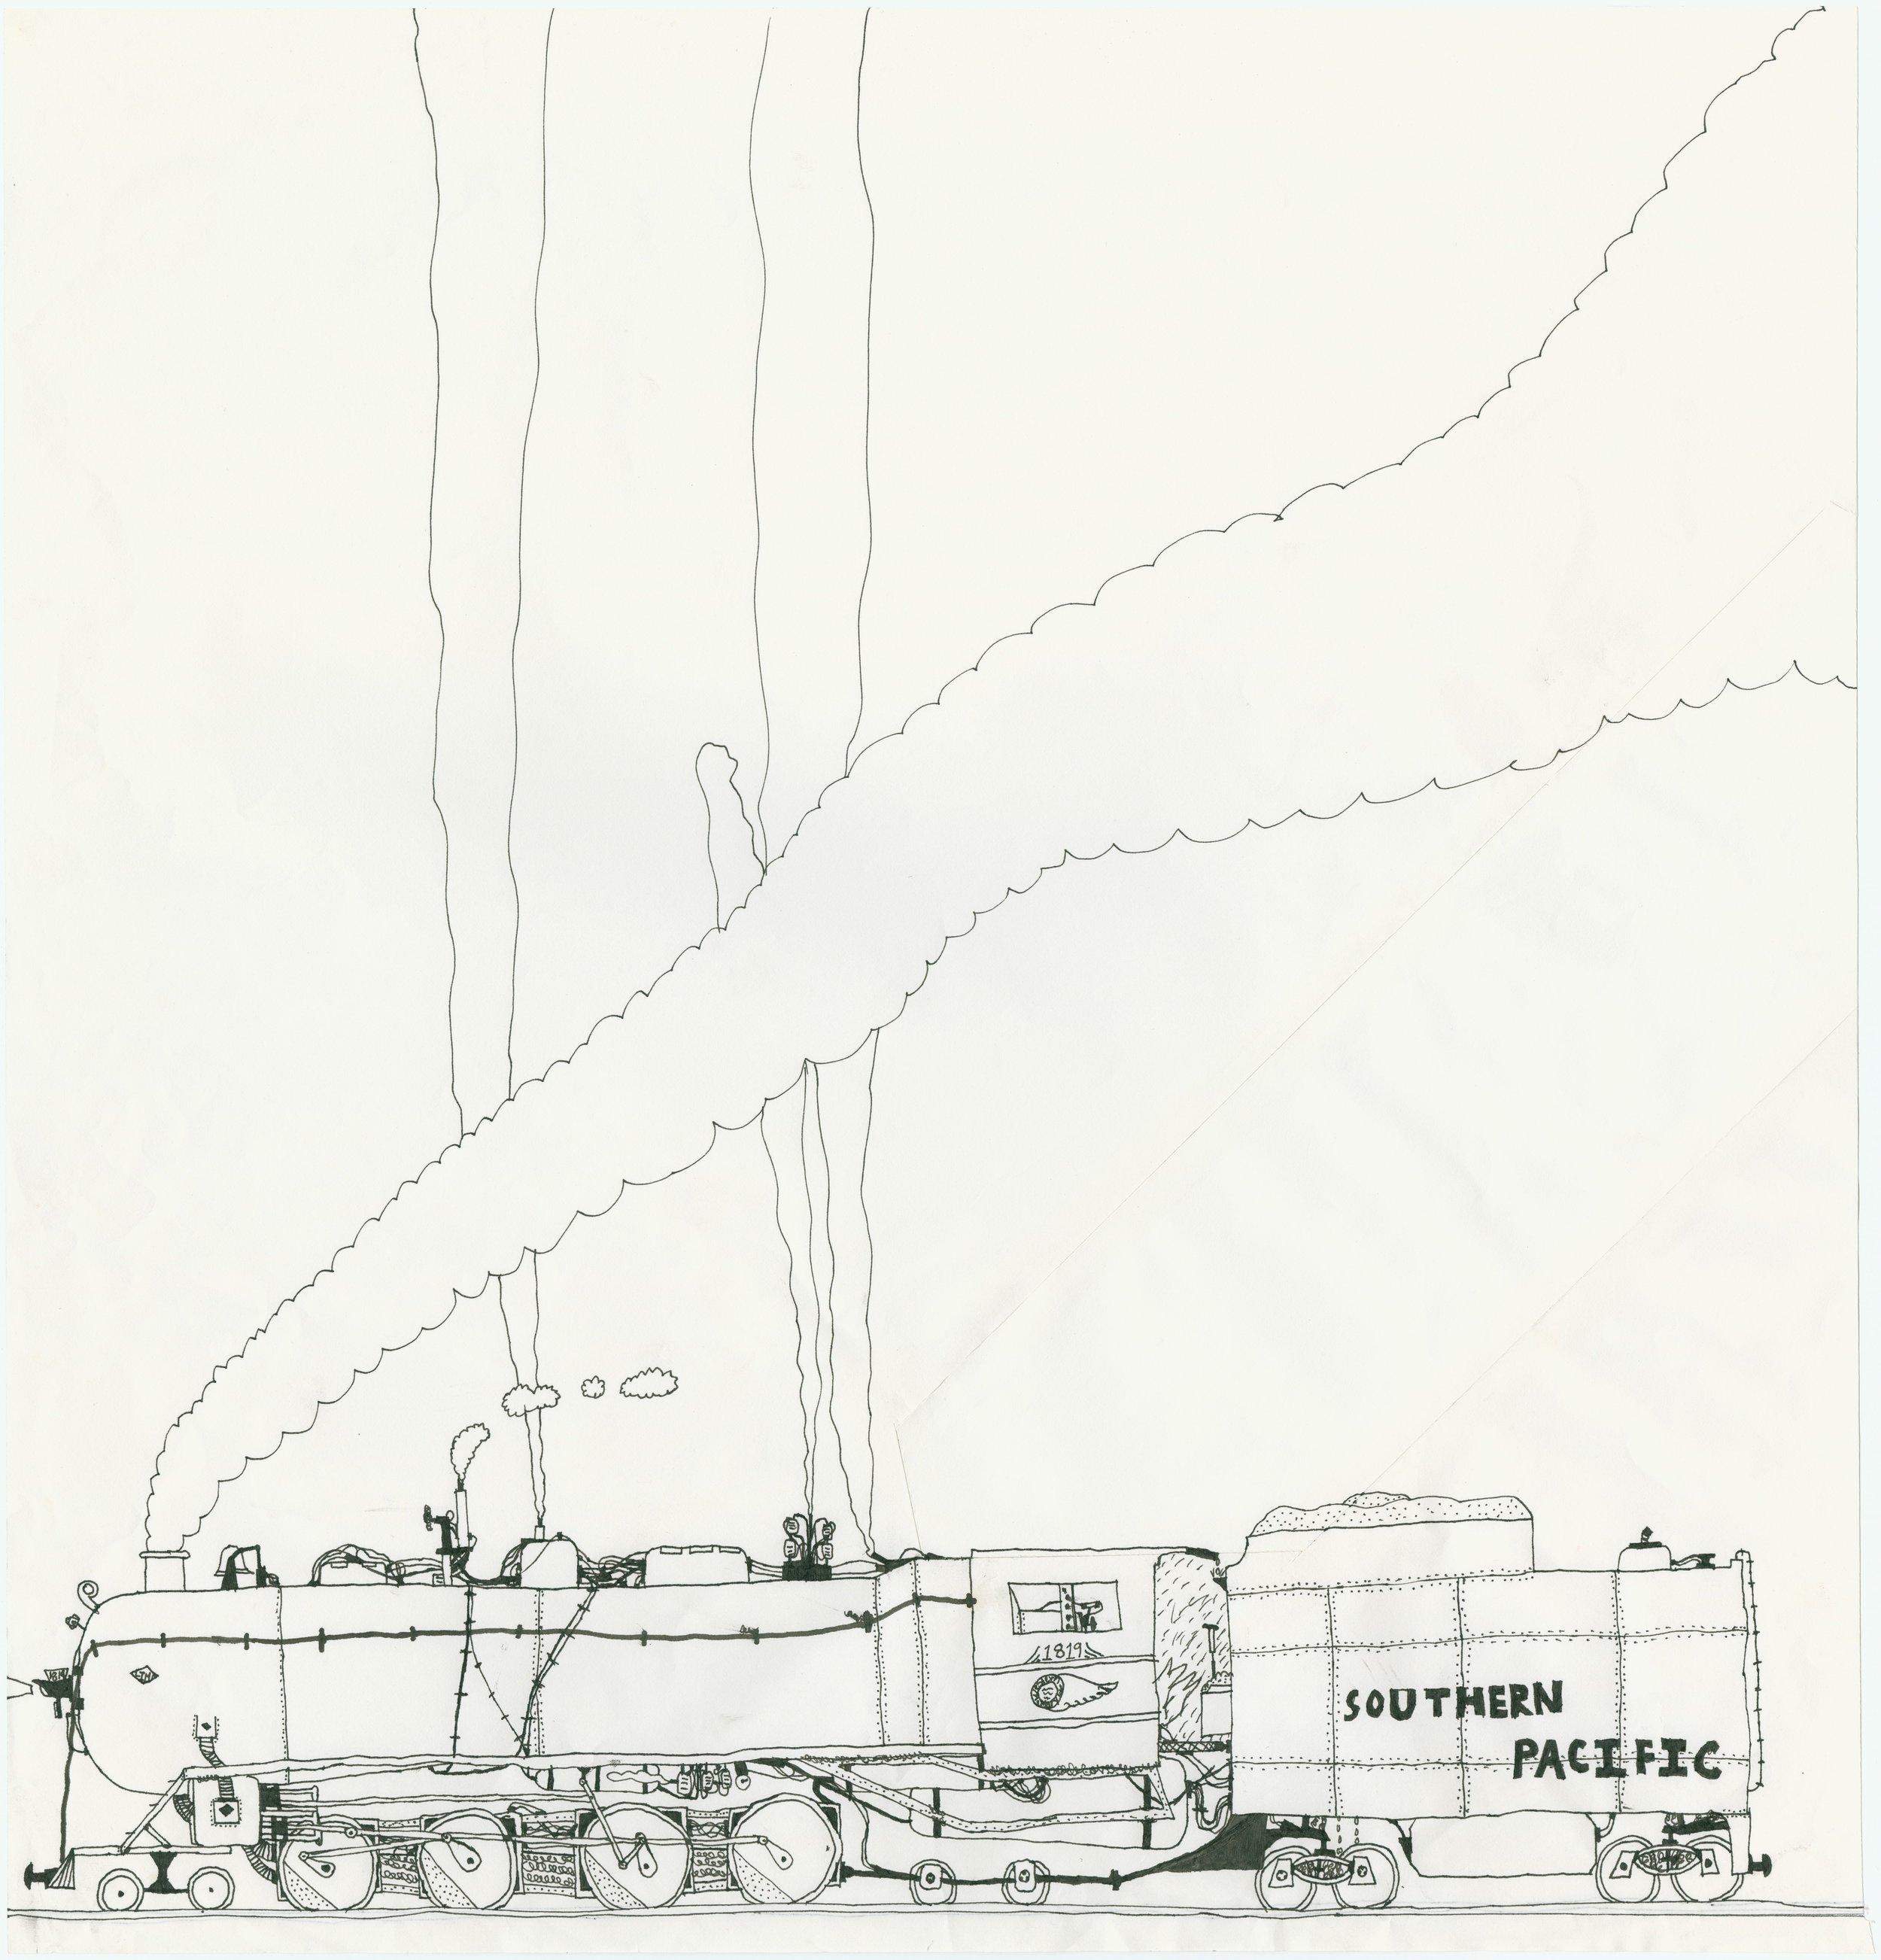 200X - 018 - Southern Pacific.pdf0000.jpg